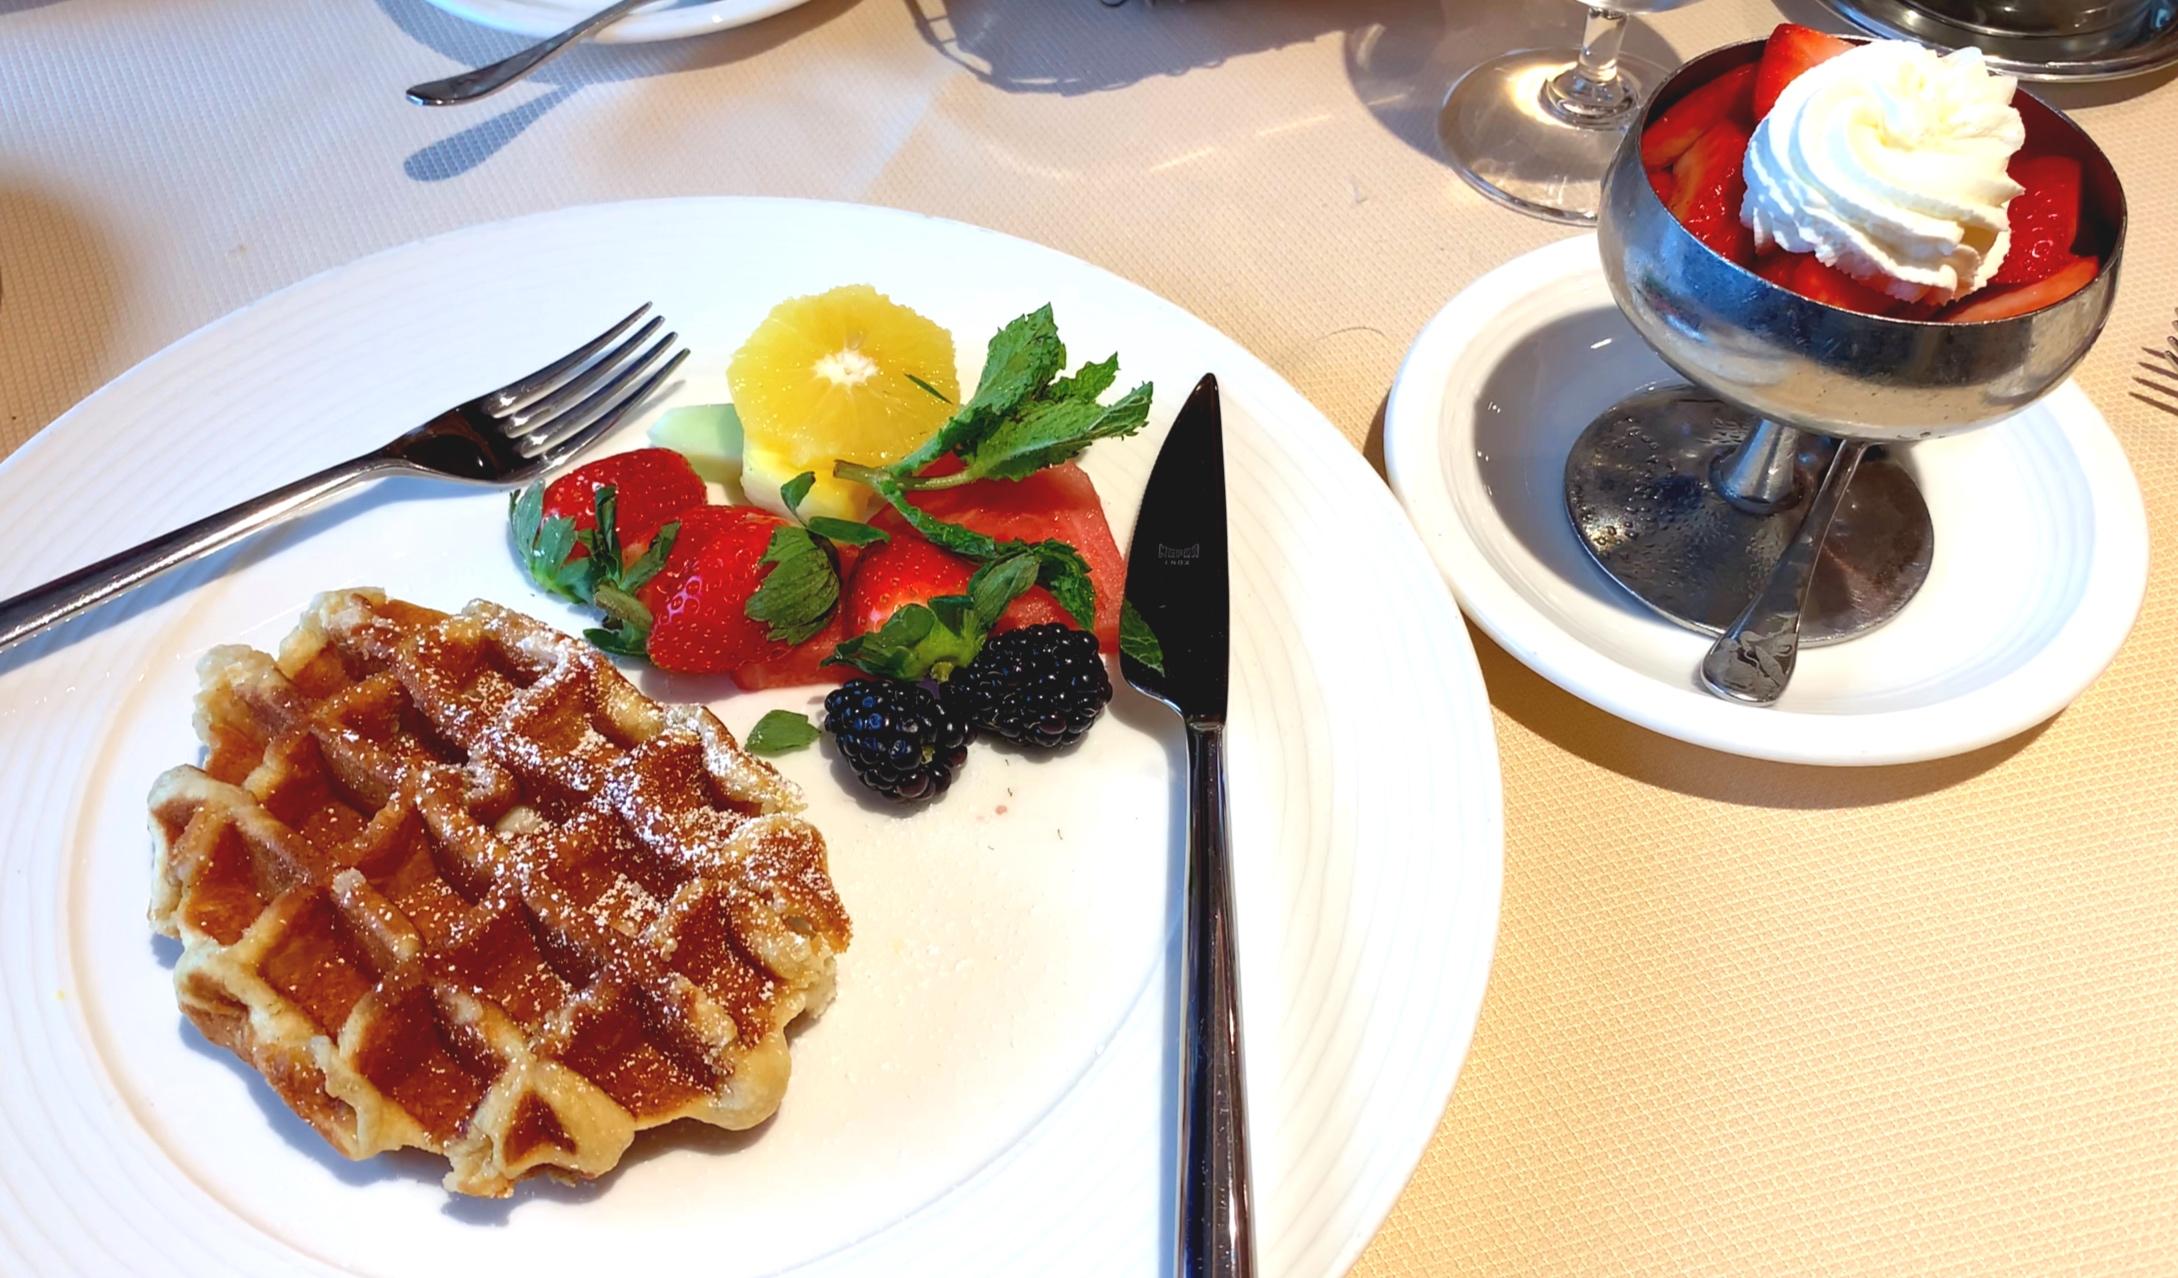 Those waffles!